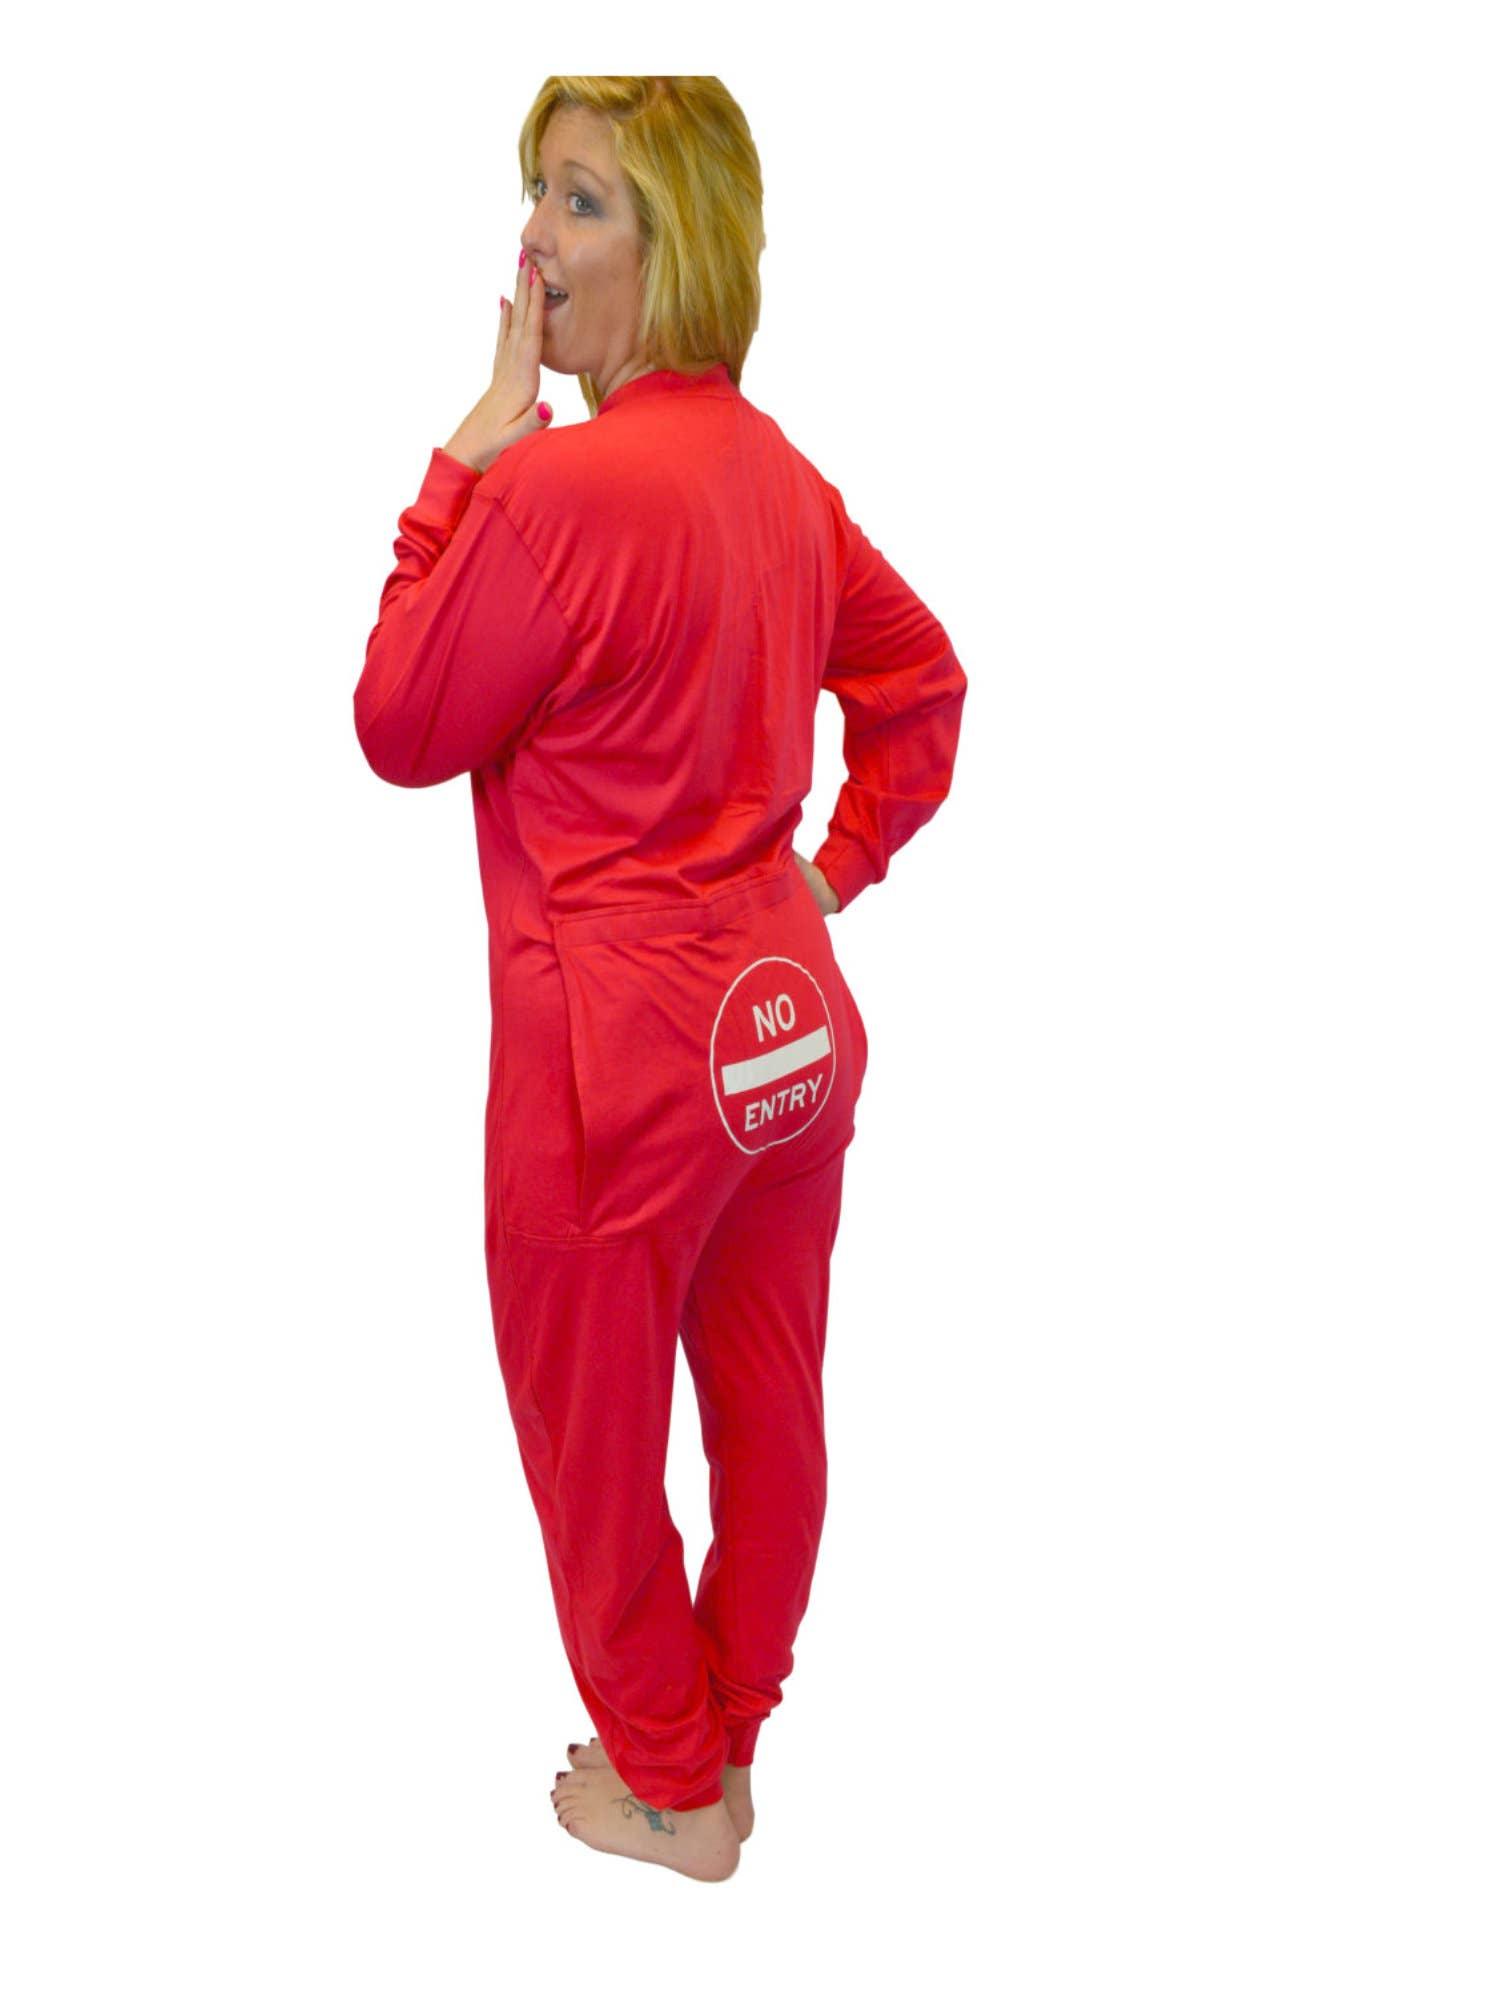 Red Union Suit Men /& Women Onesie Pajamas with Funny Butt Flap Danger Blasting Area 354-BLST